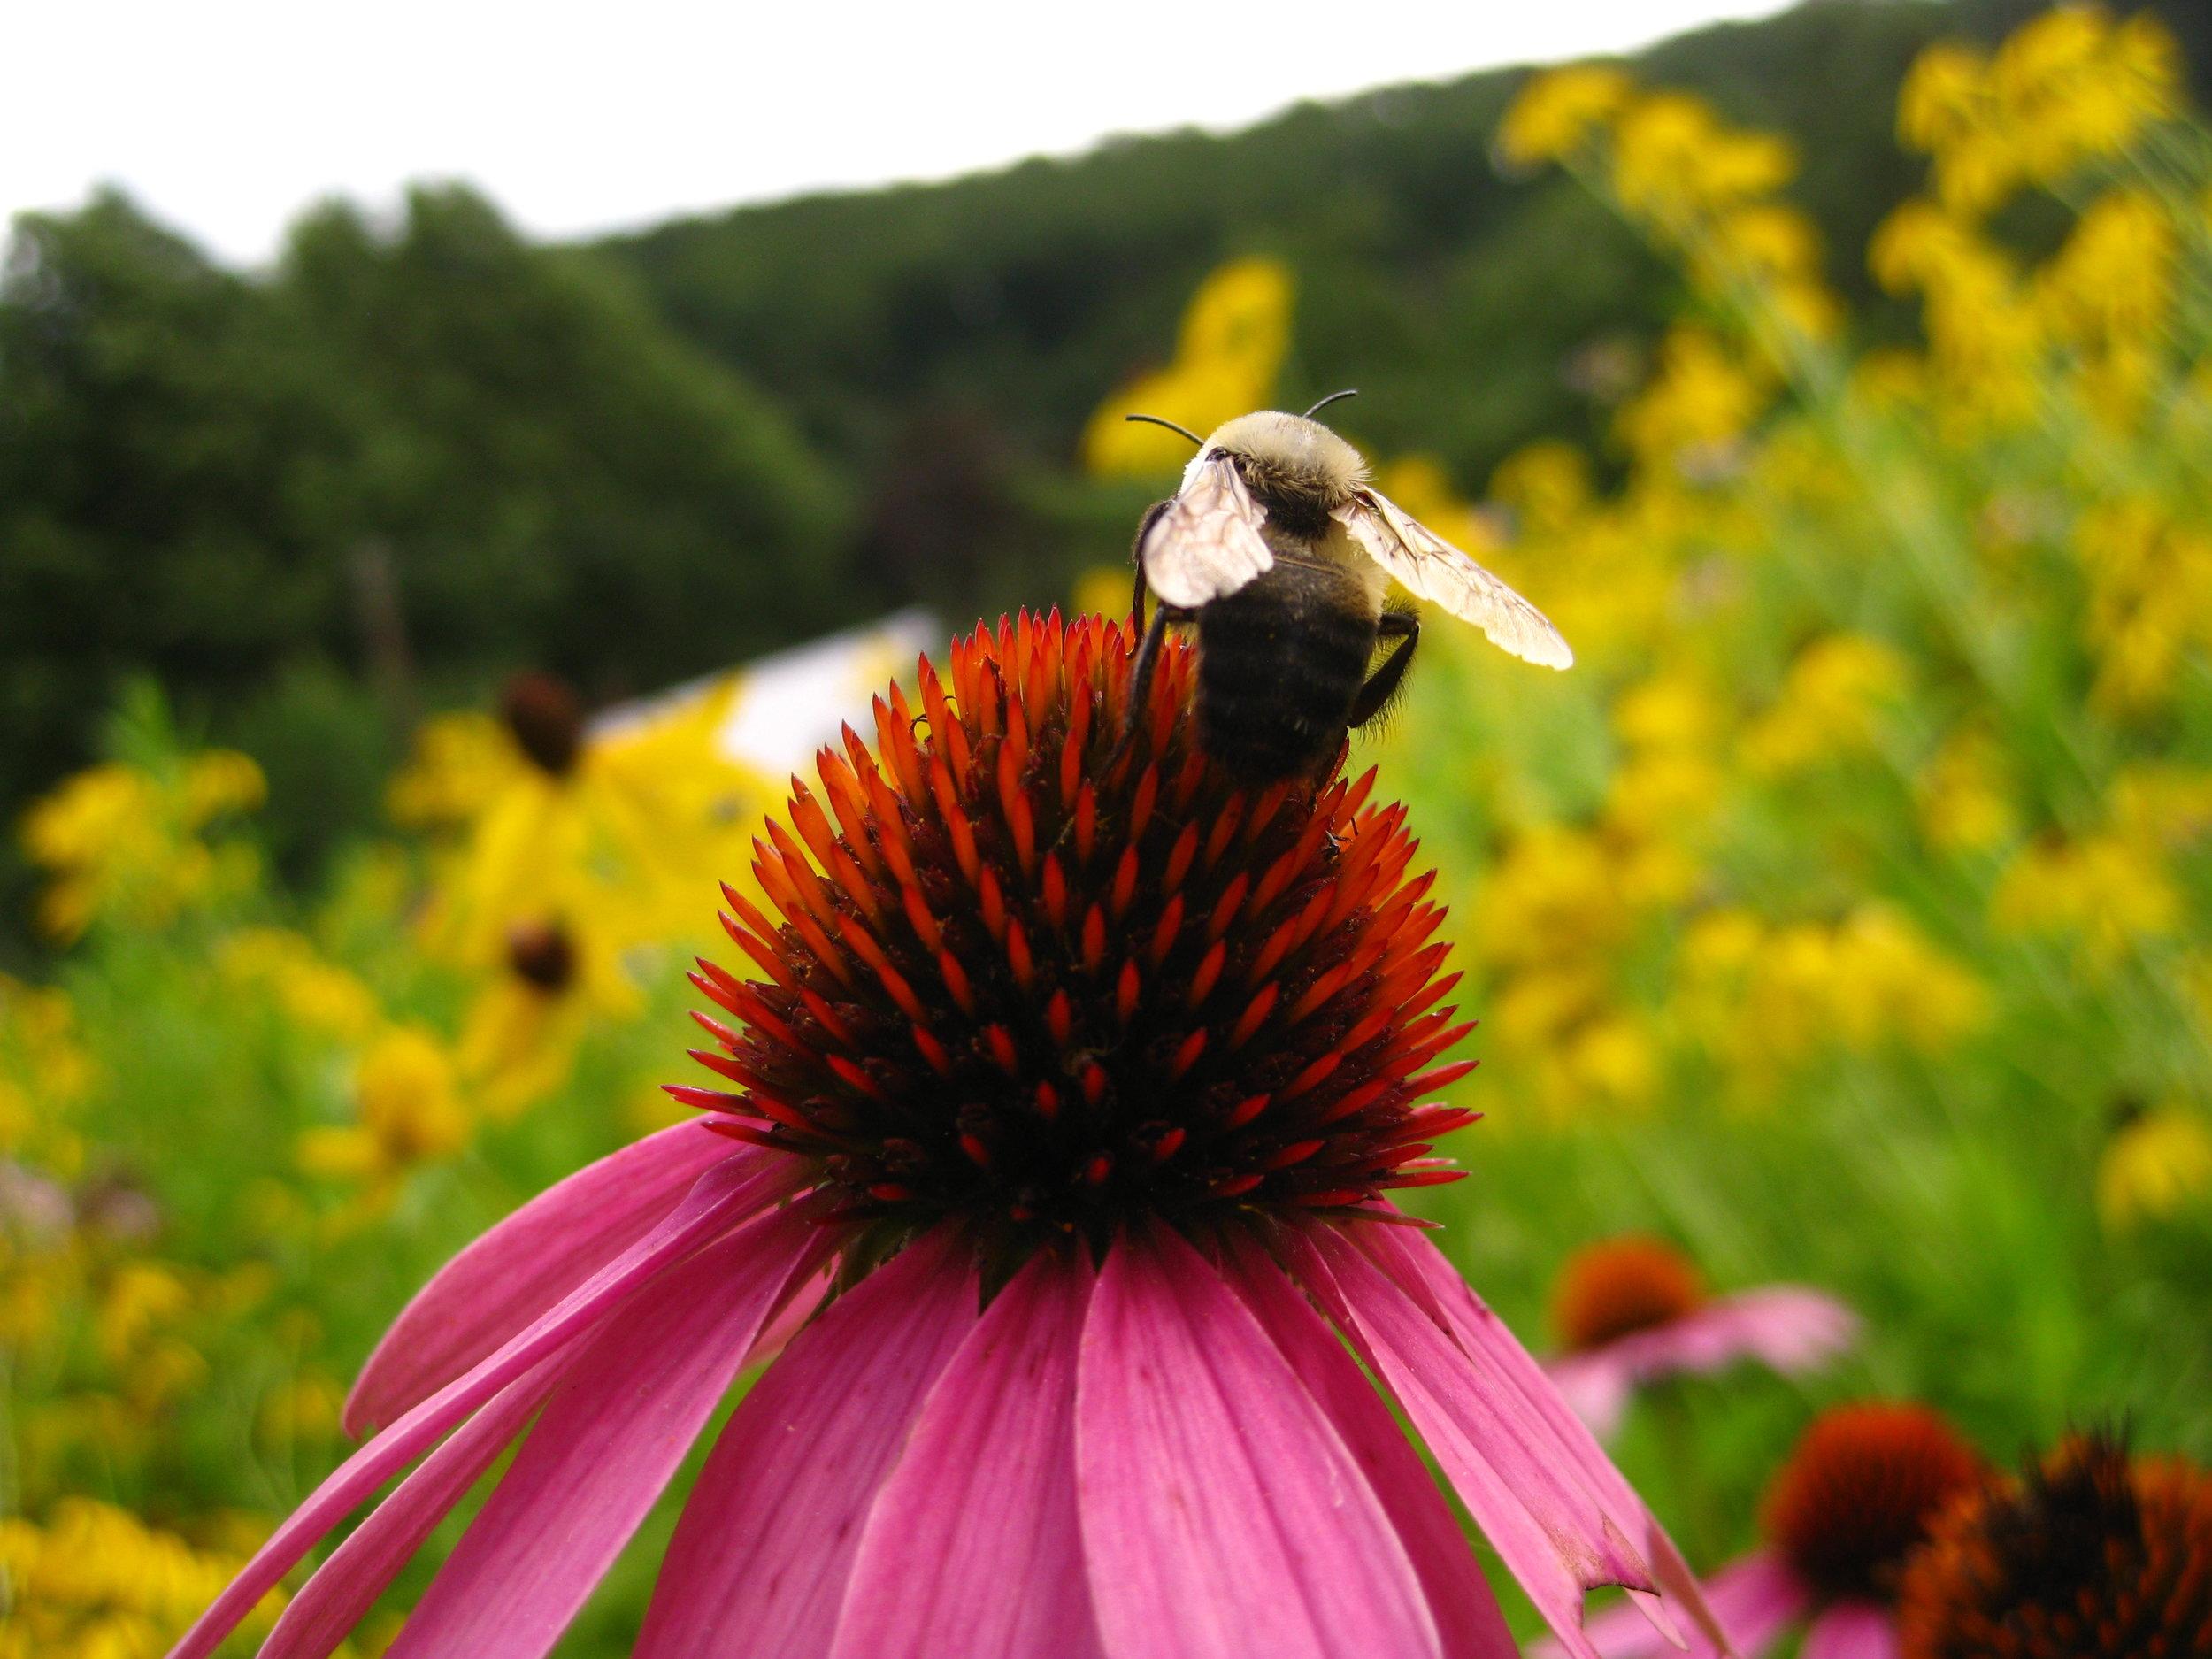 Copy of Bumble bee aka a wild pollinator!